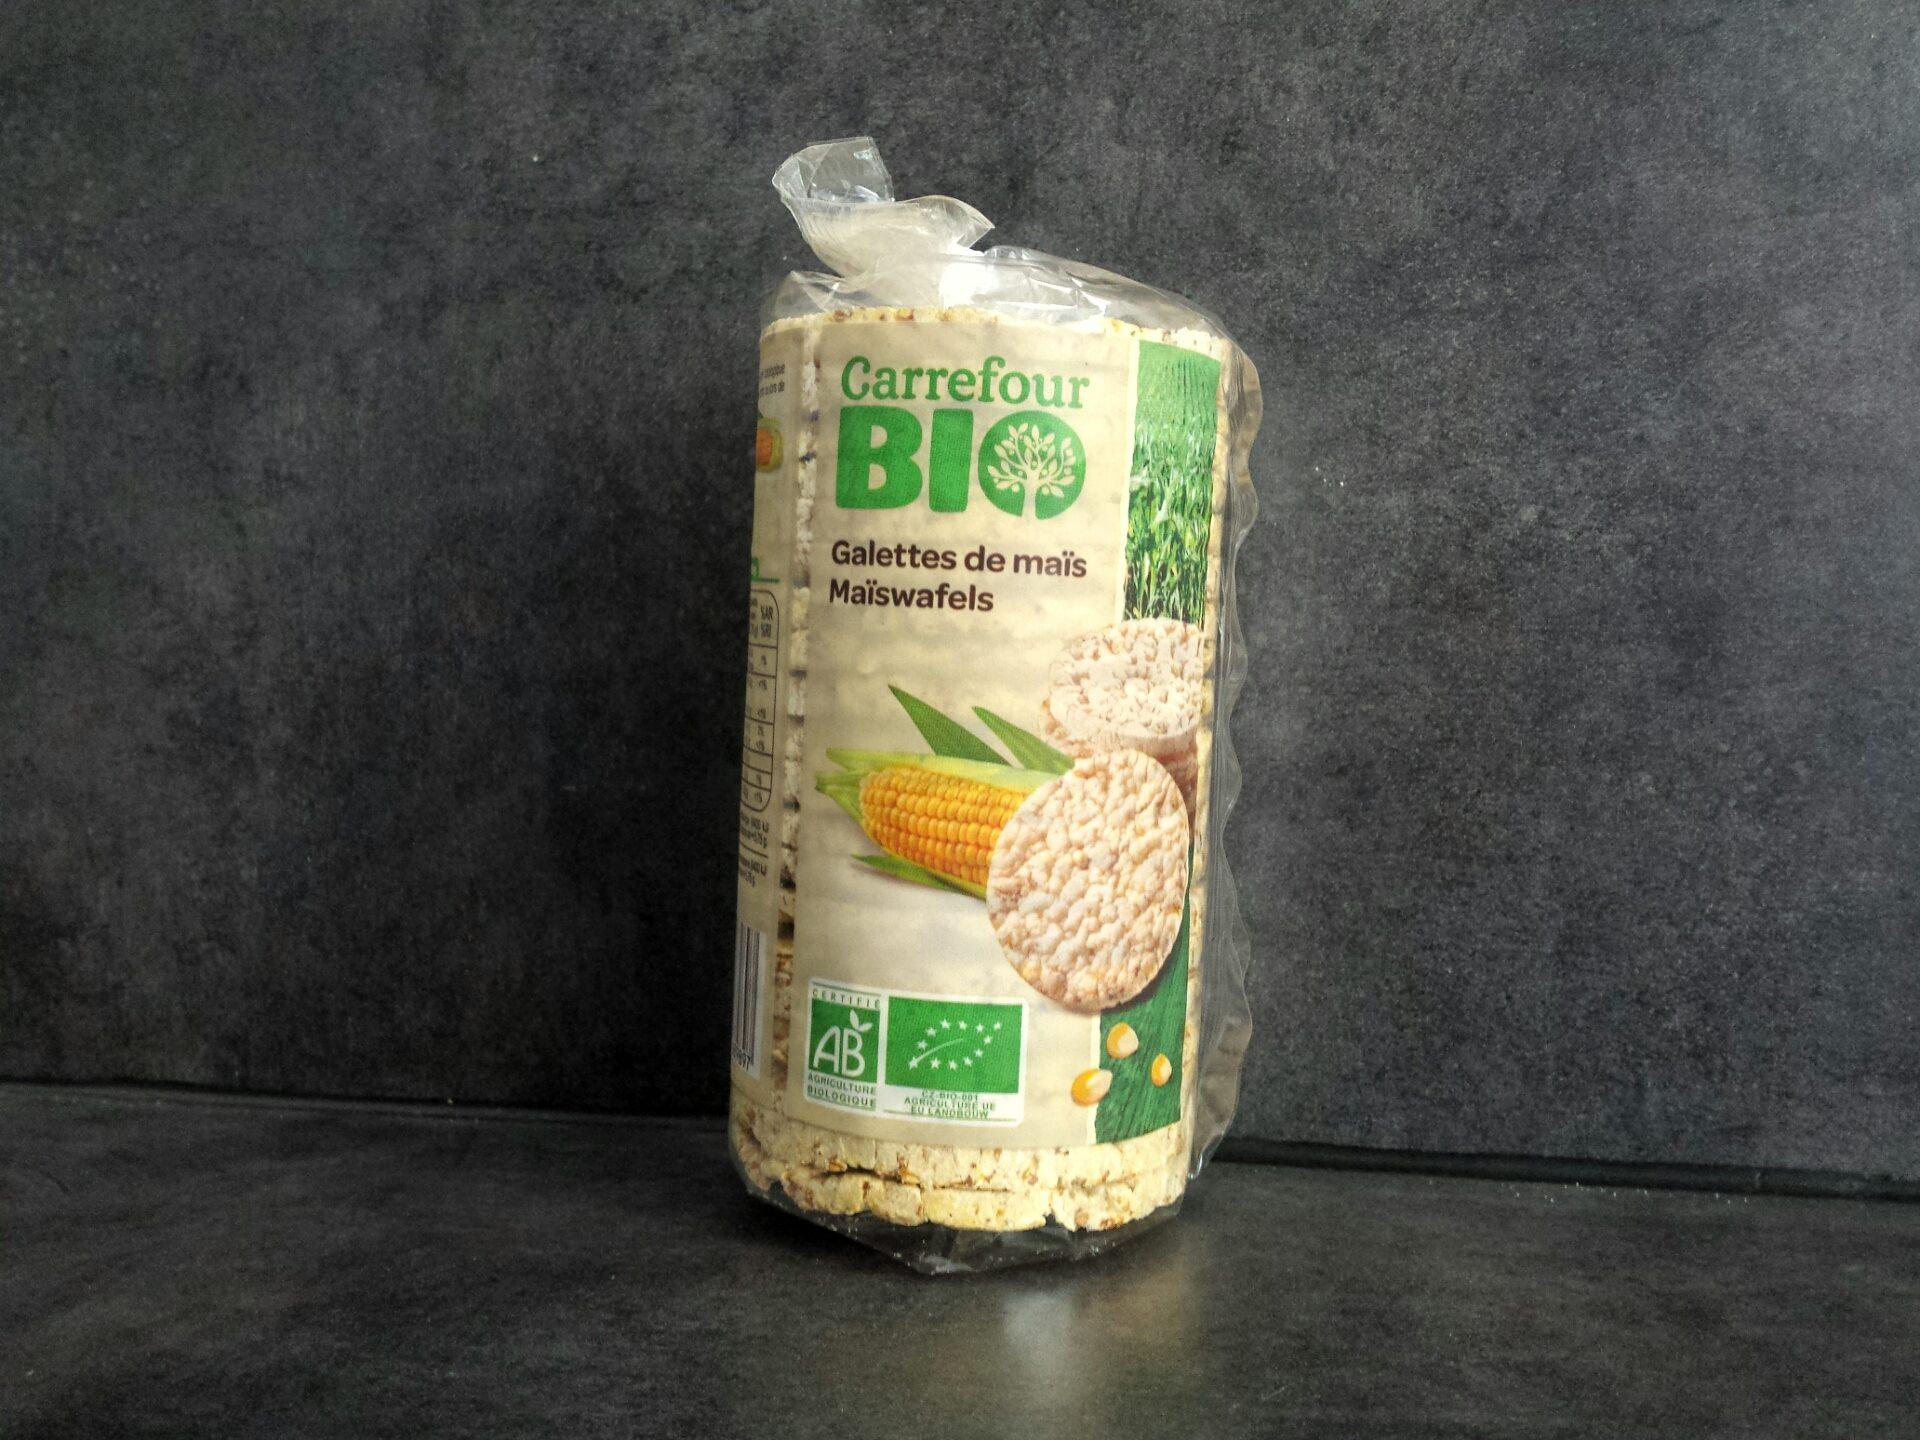 Galette de riz musculation eviter